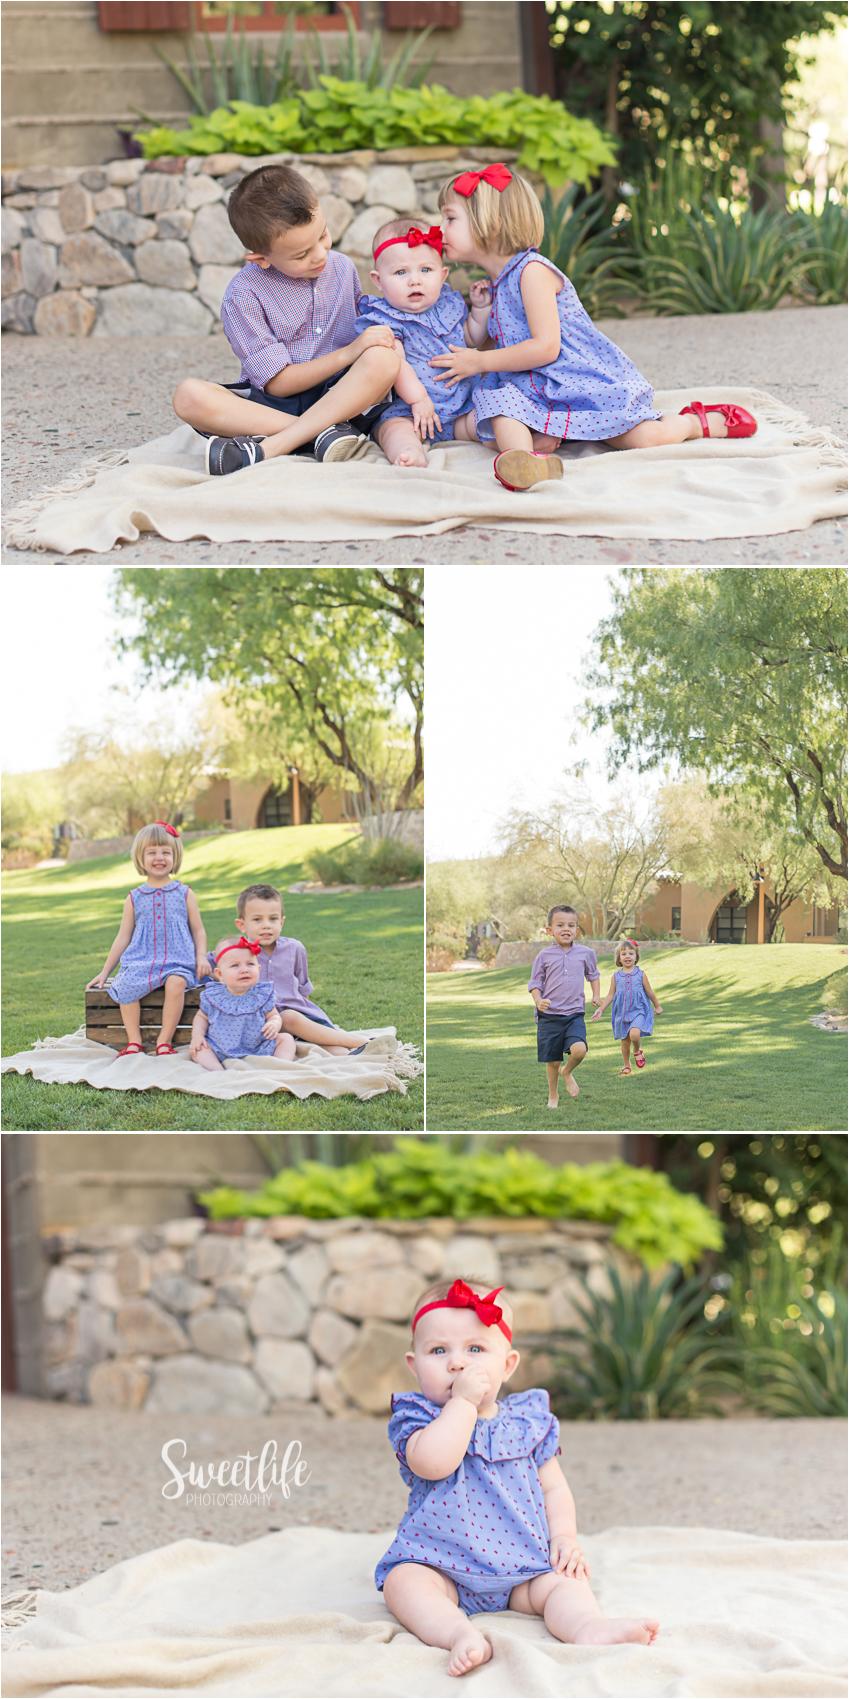 Phoenix-Family-and-Child-Photographer-www.sweetlife-photography.com_.jpg